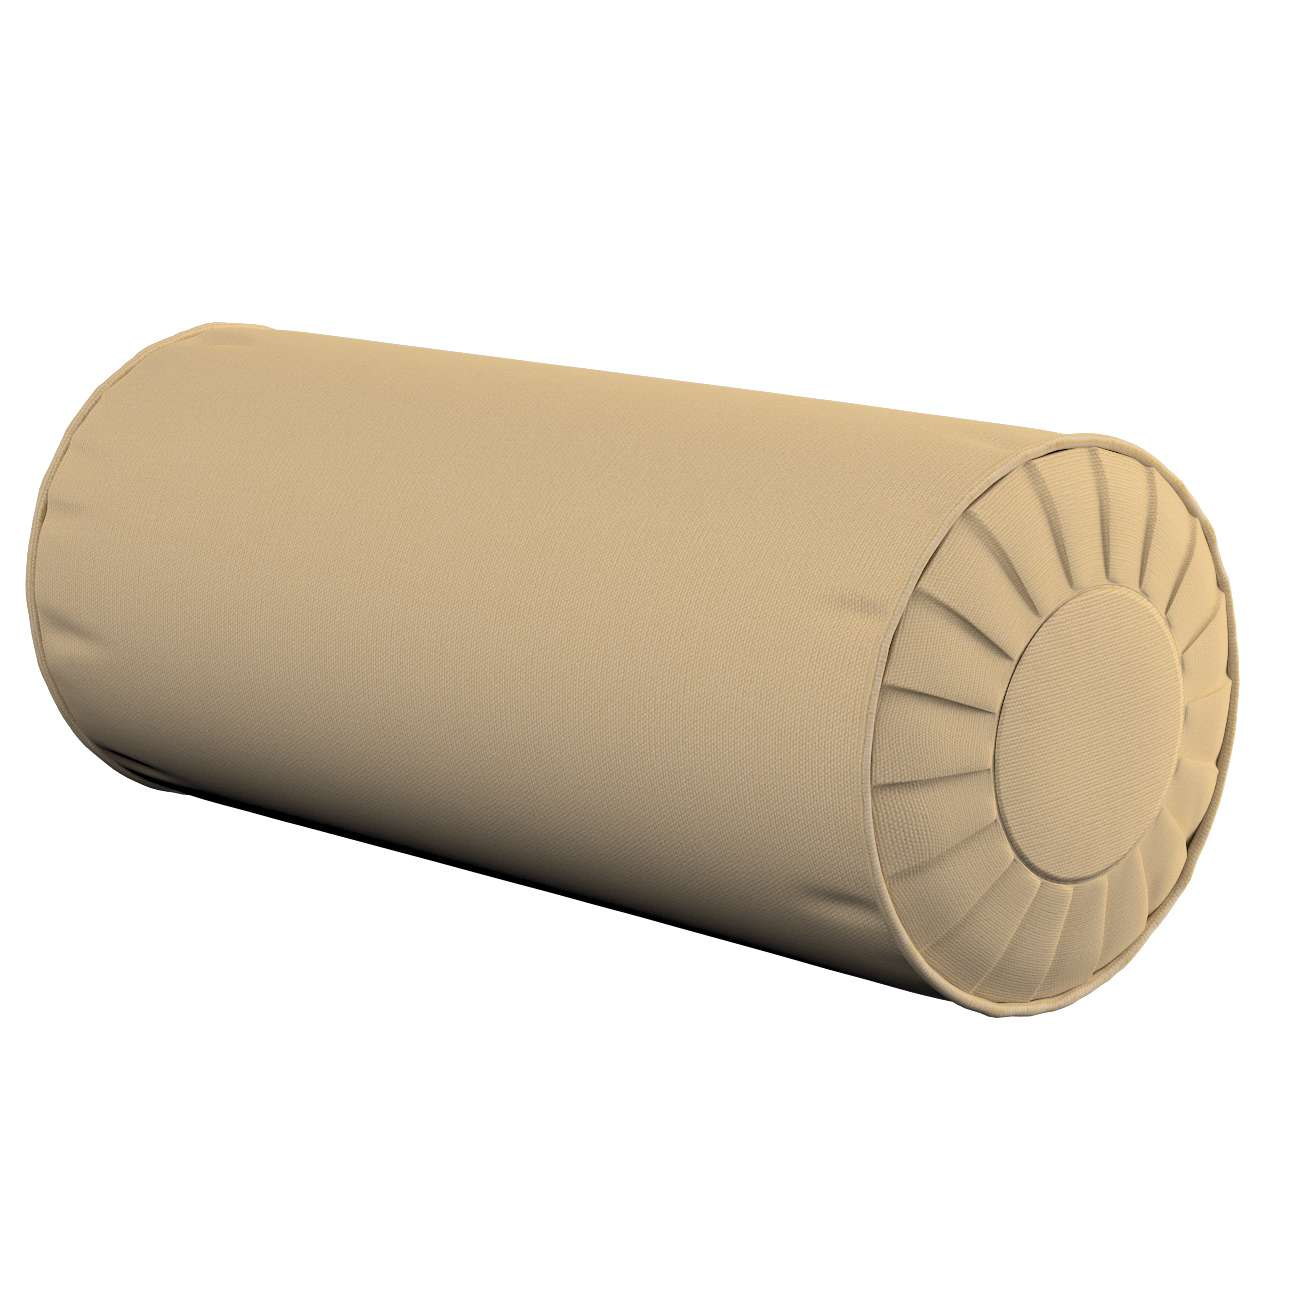 Nakkepude med folder Ø 20 × 50 cm fra kollektionen Cotton Panama, Stof: 702-01